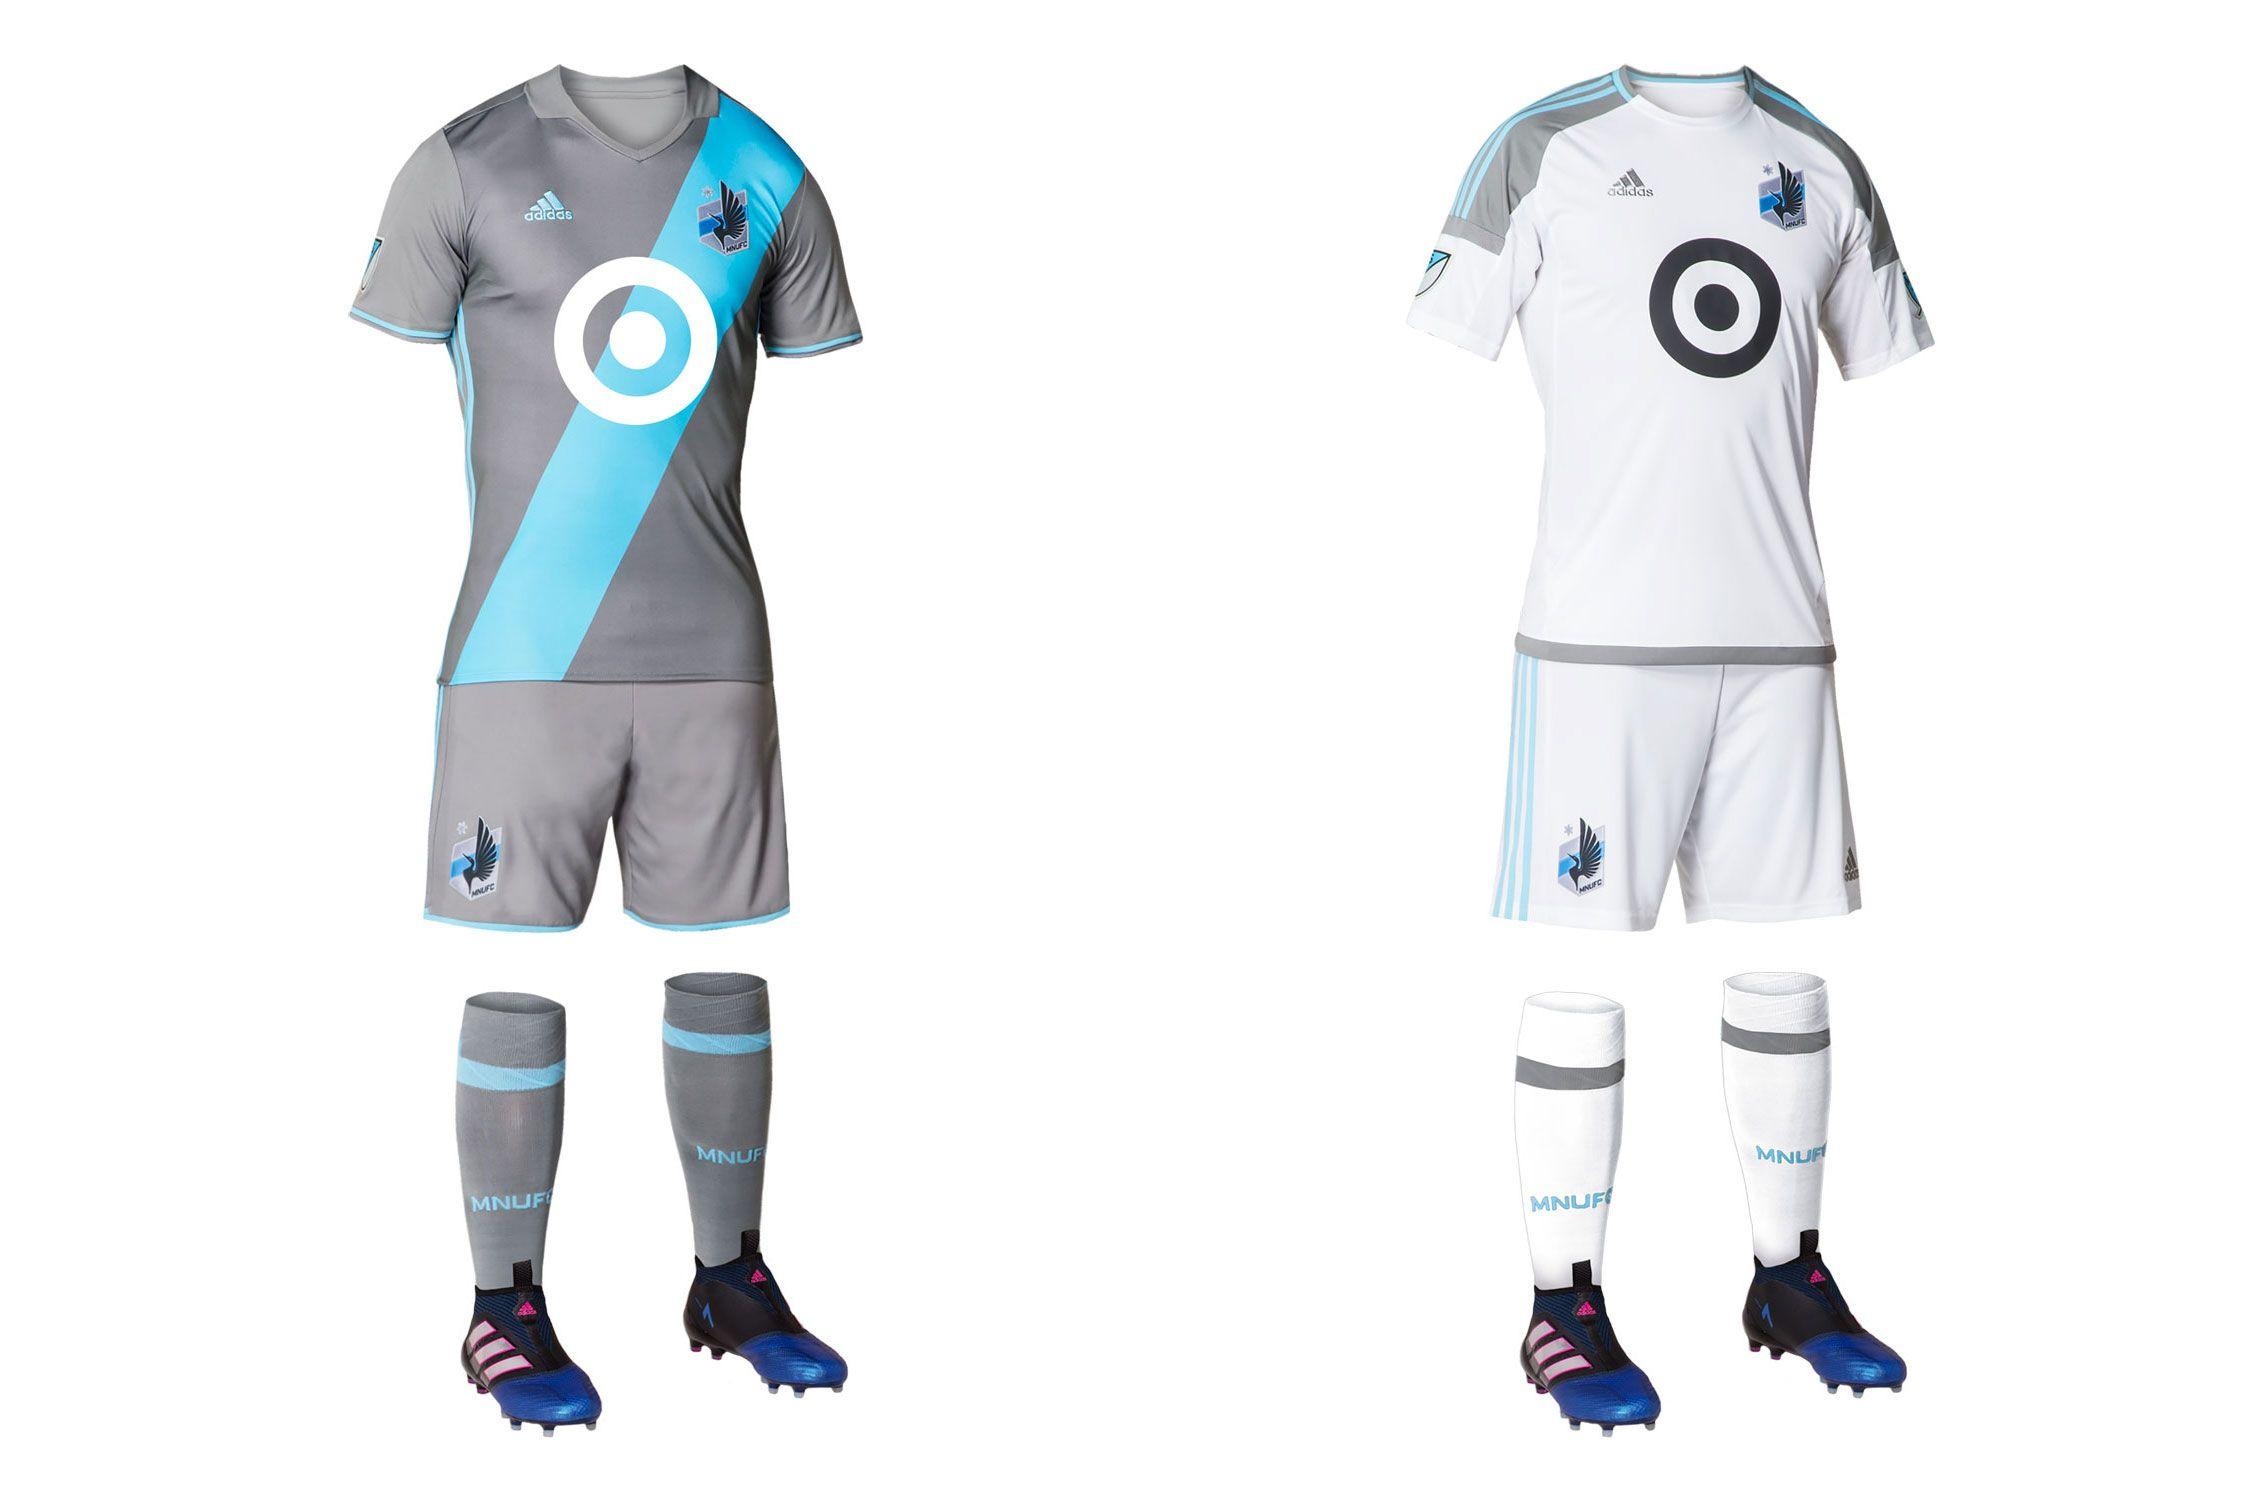 0e6d3d8fe301 Photos: All of the 2017 MLS uniforms | Minnesota United | Minnesota ...